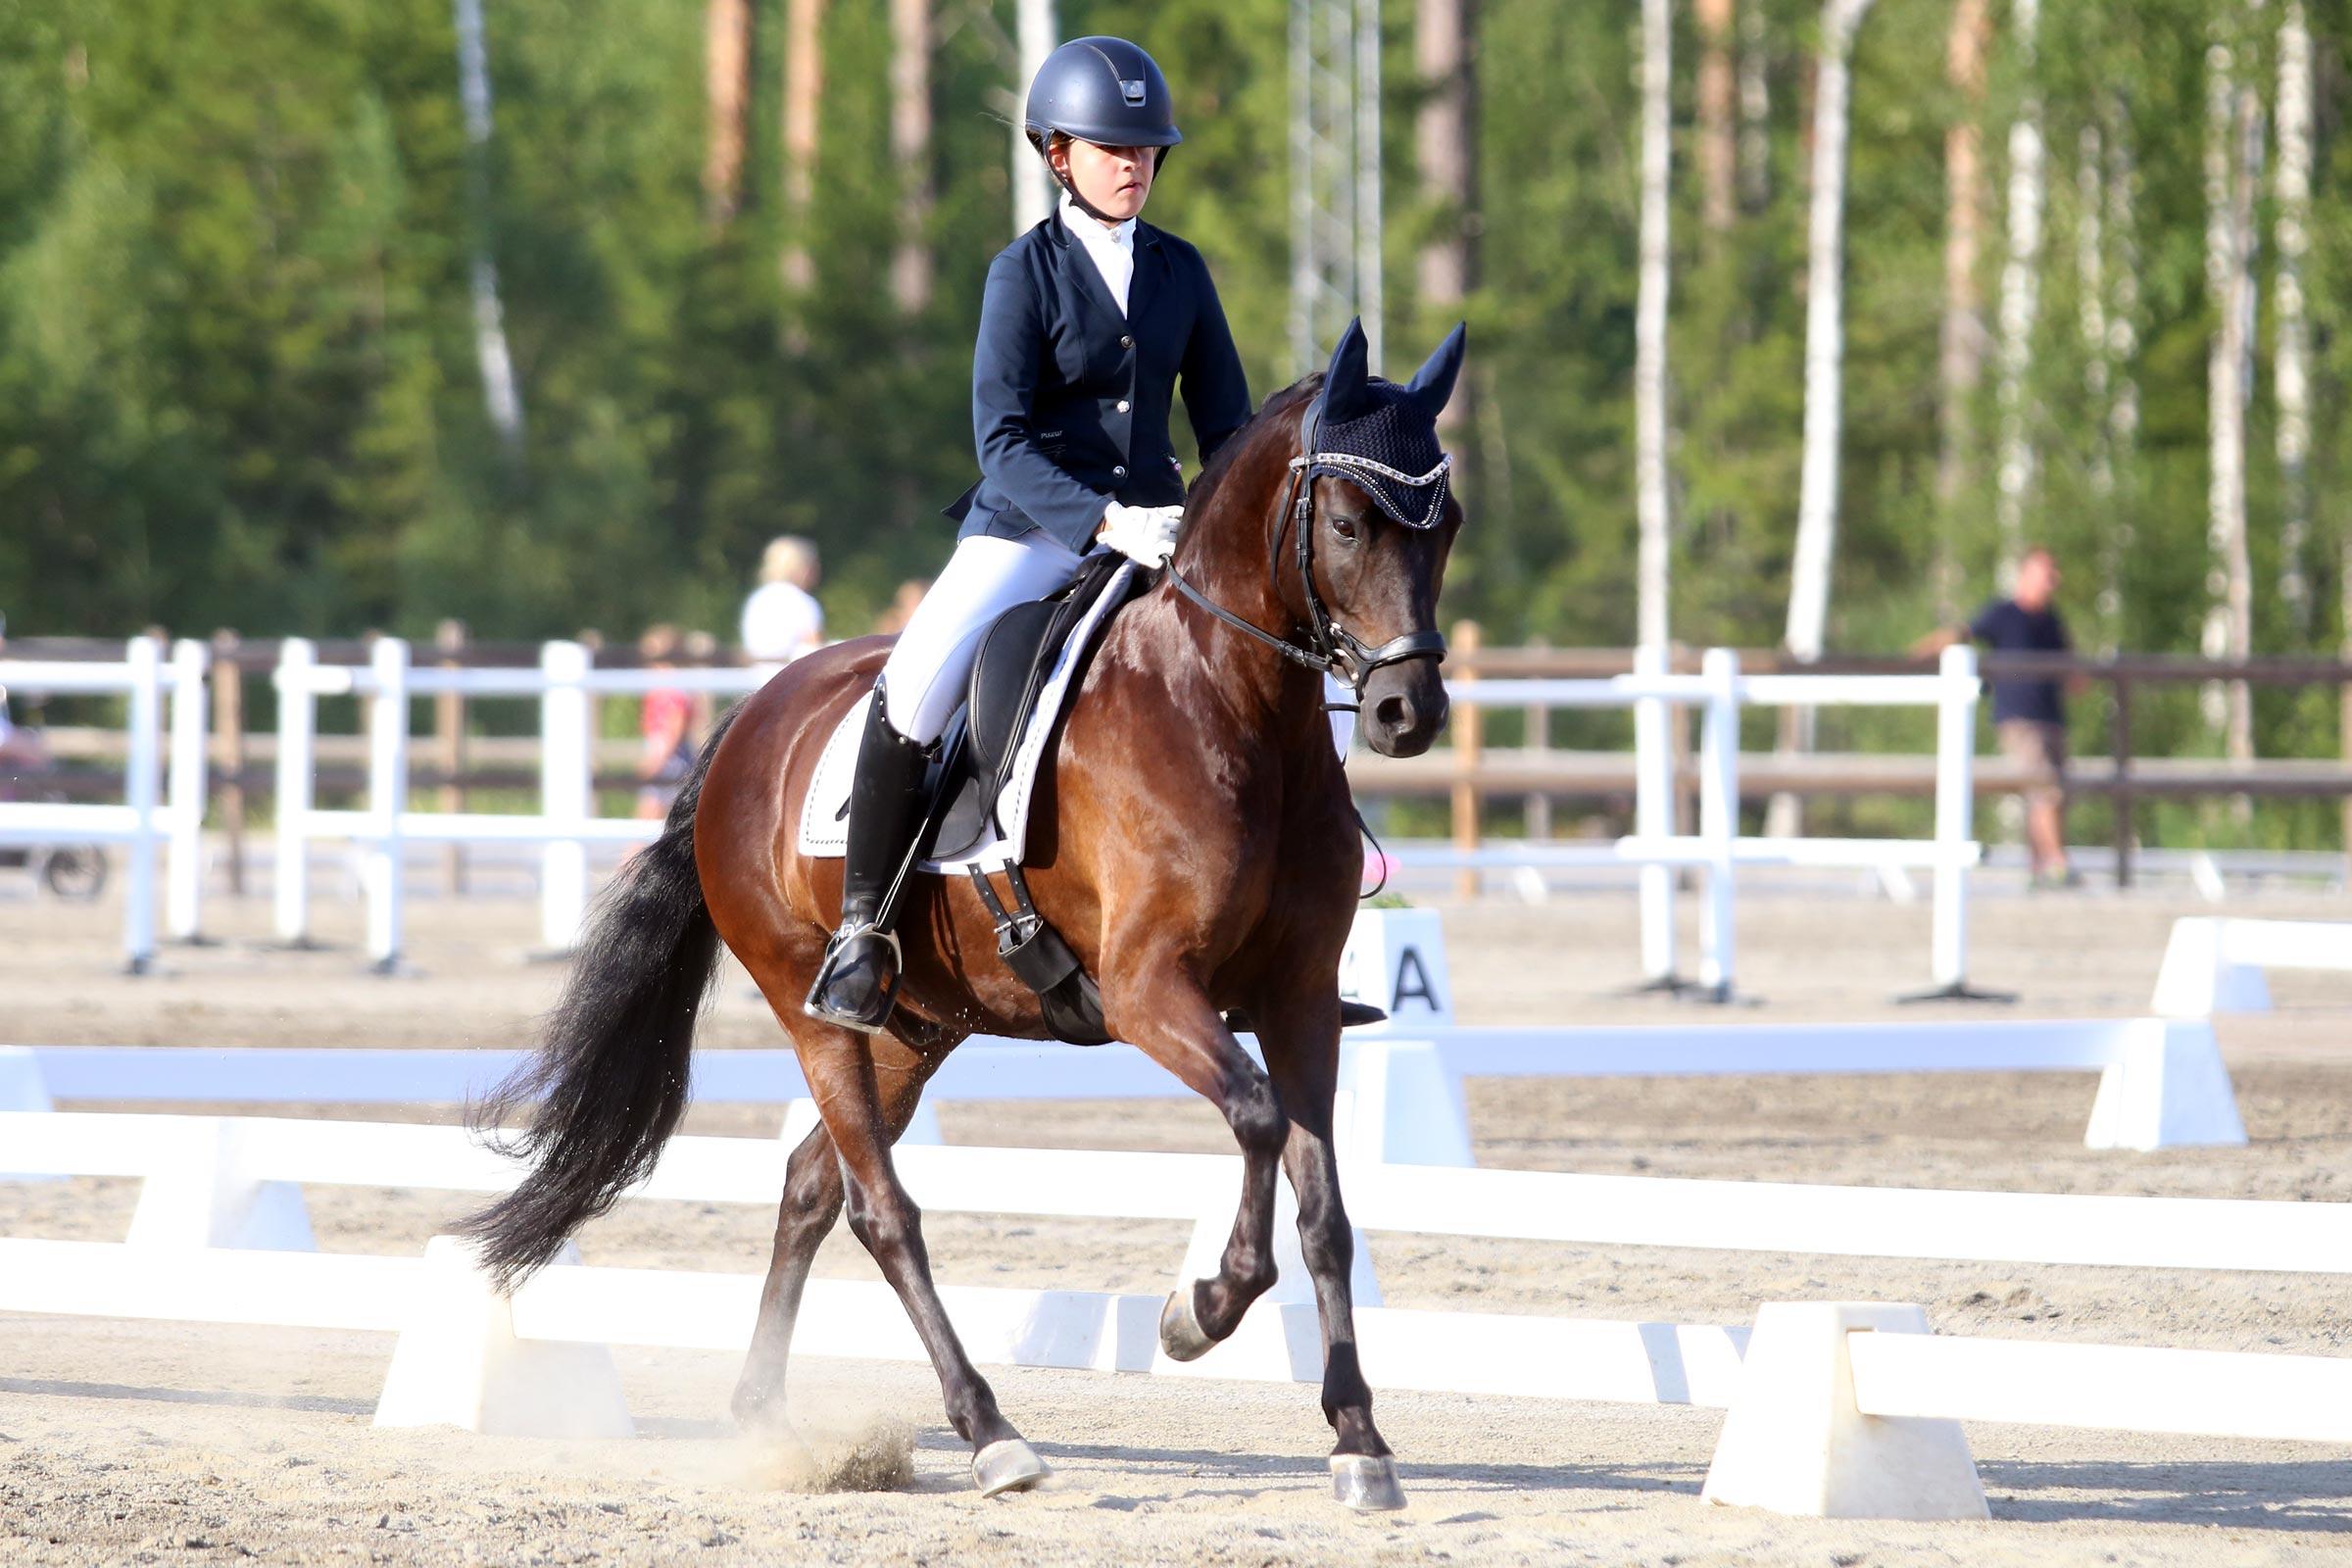 Brons: Julia Roswall - Taxman (ASRP val f-12 e Weltman-Lodor Tywysog, uppf AB Novitas) 159,00